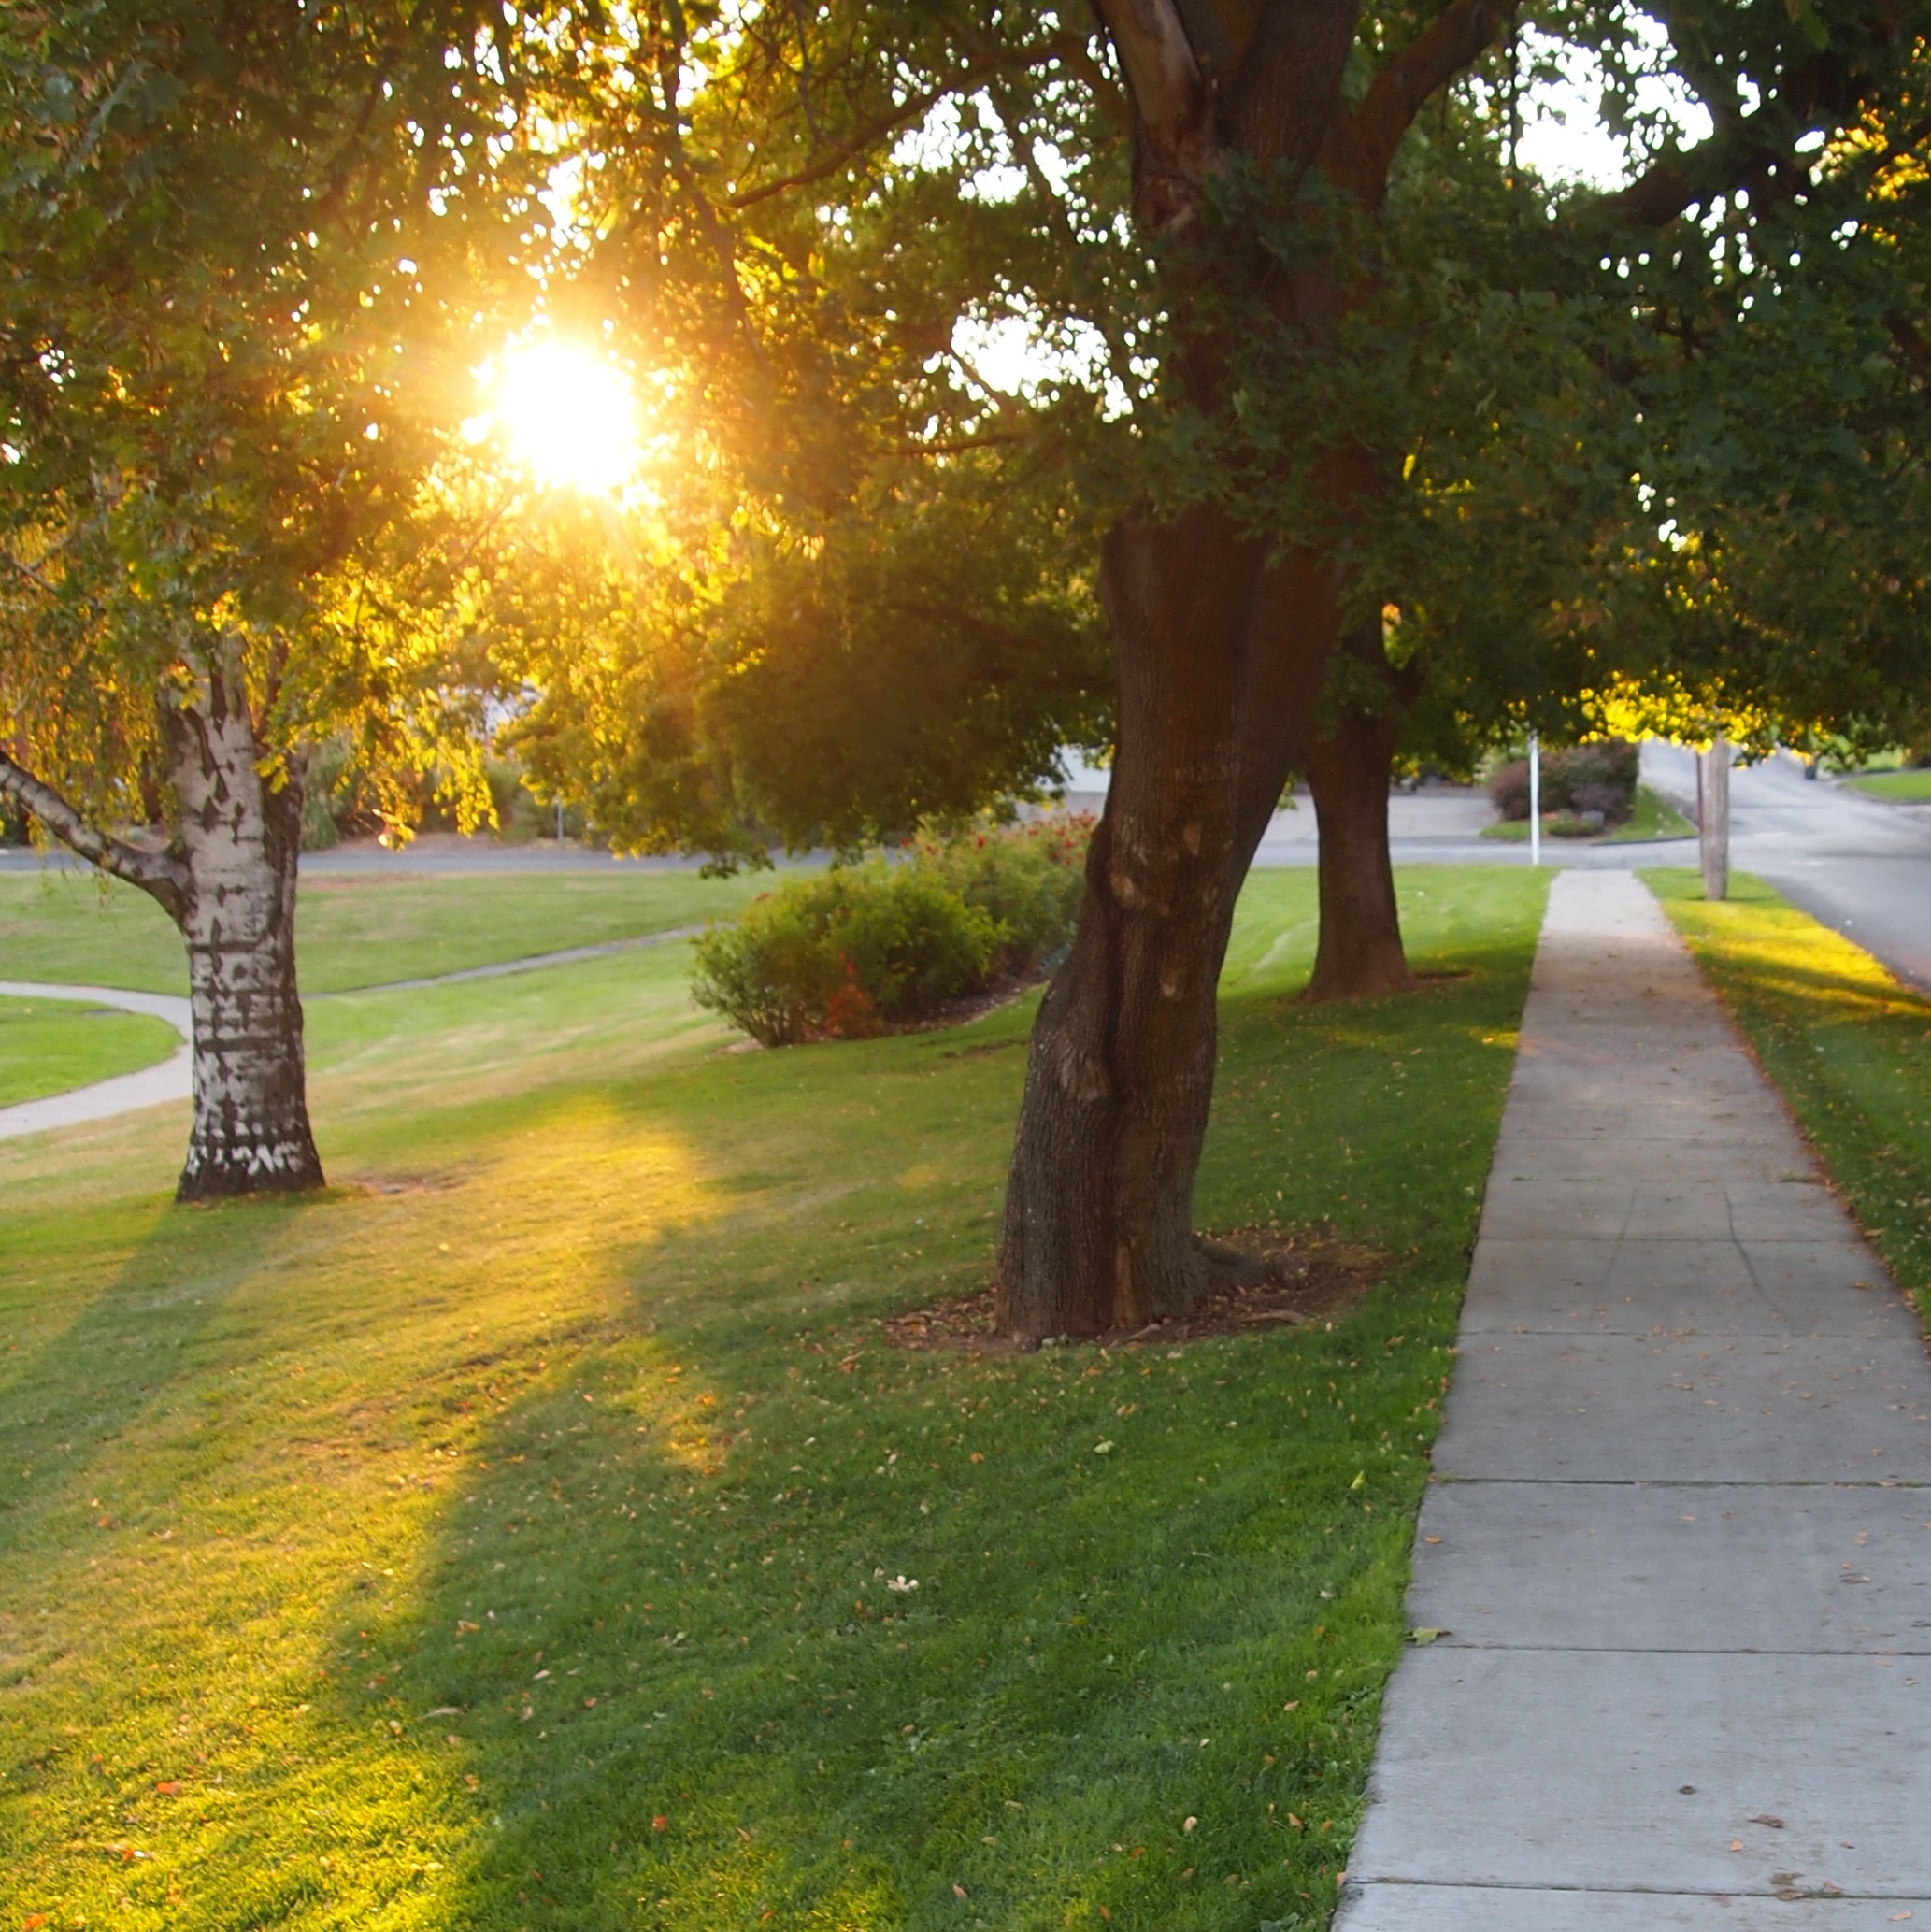 Franklin Park / Chestnut Ave